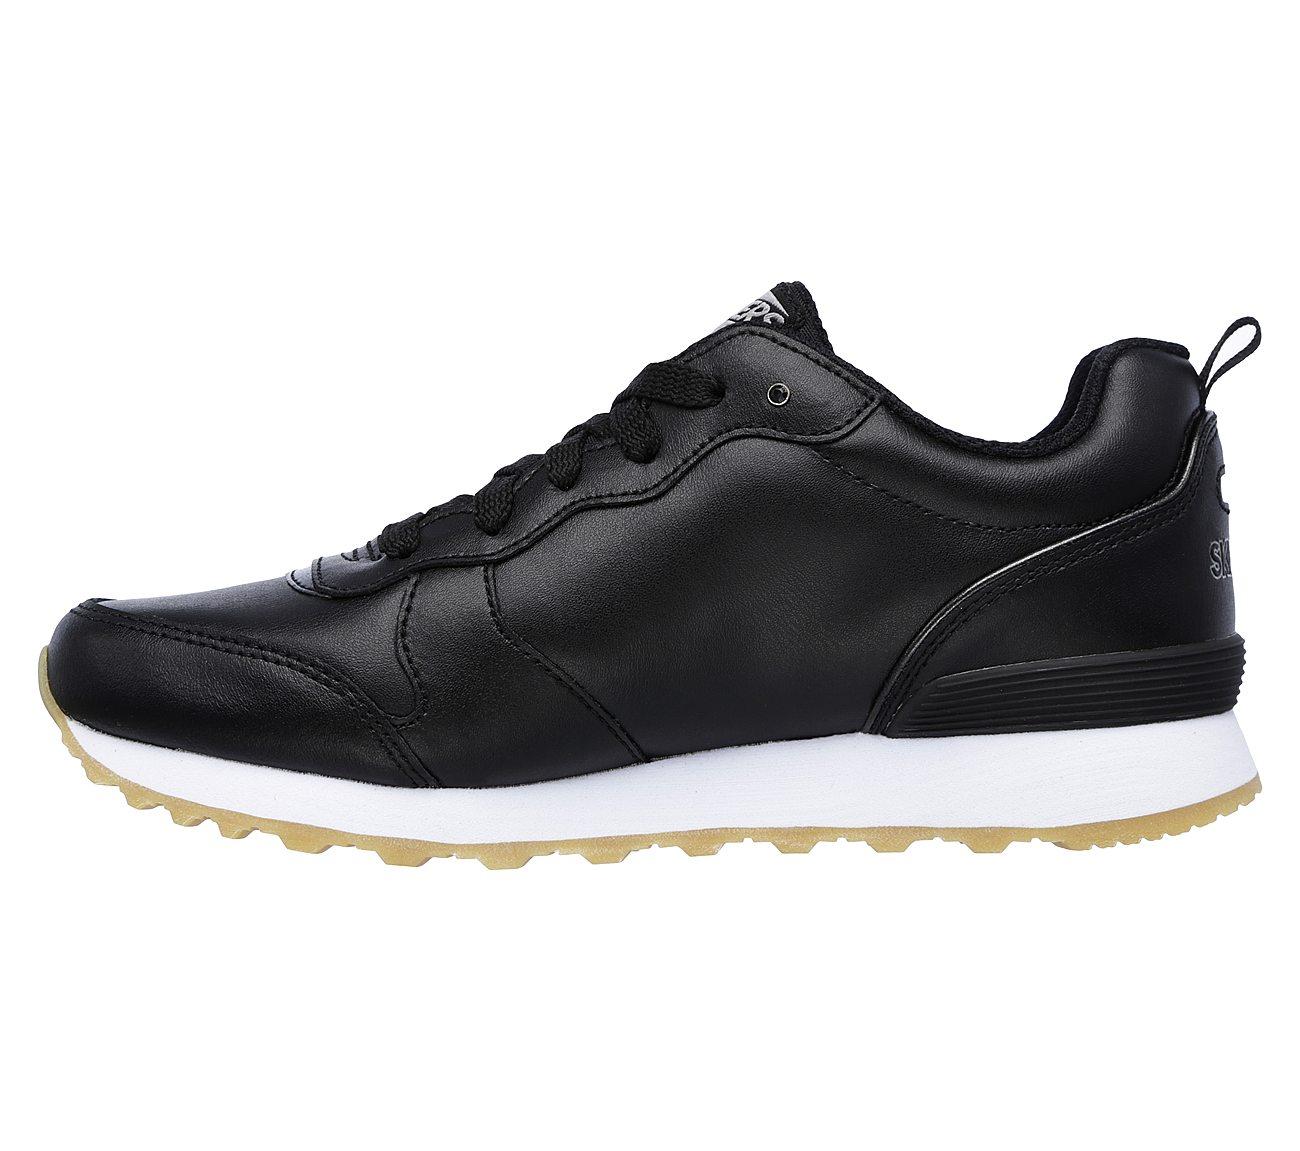 310650e99a49 Buy SKECHERS OG 85 - Street Sneak Low Originals Shoes only  65.00